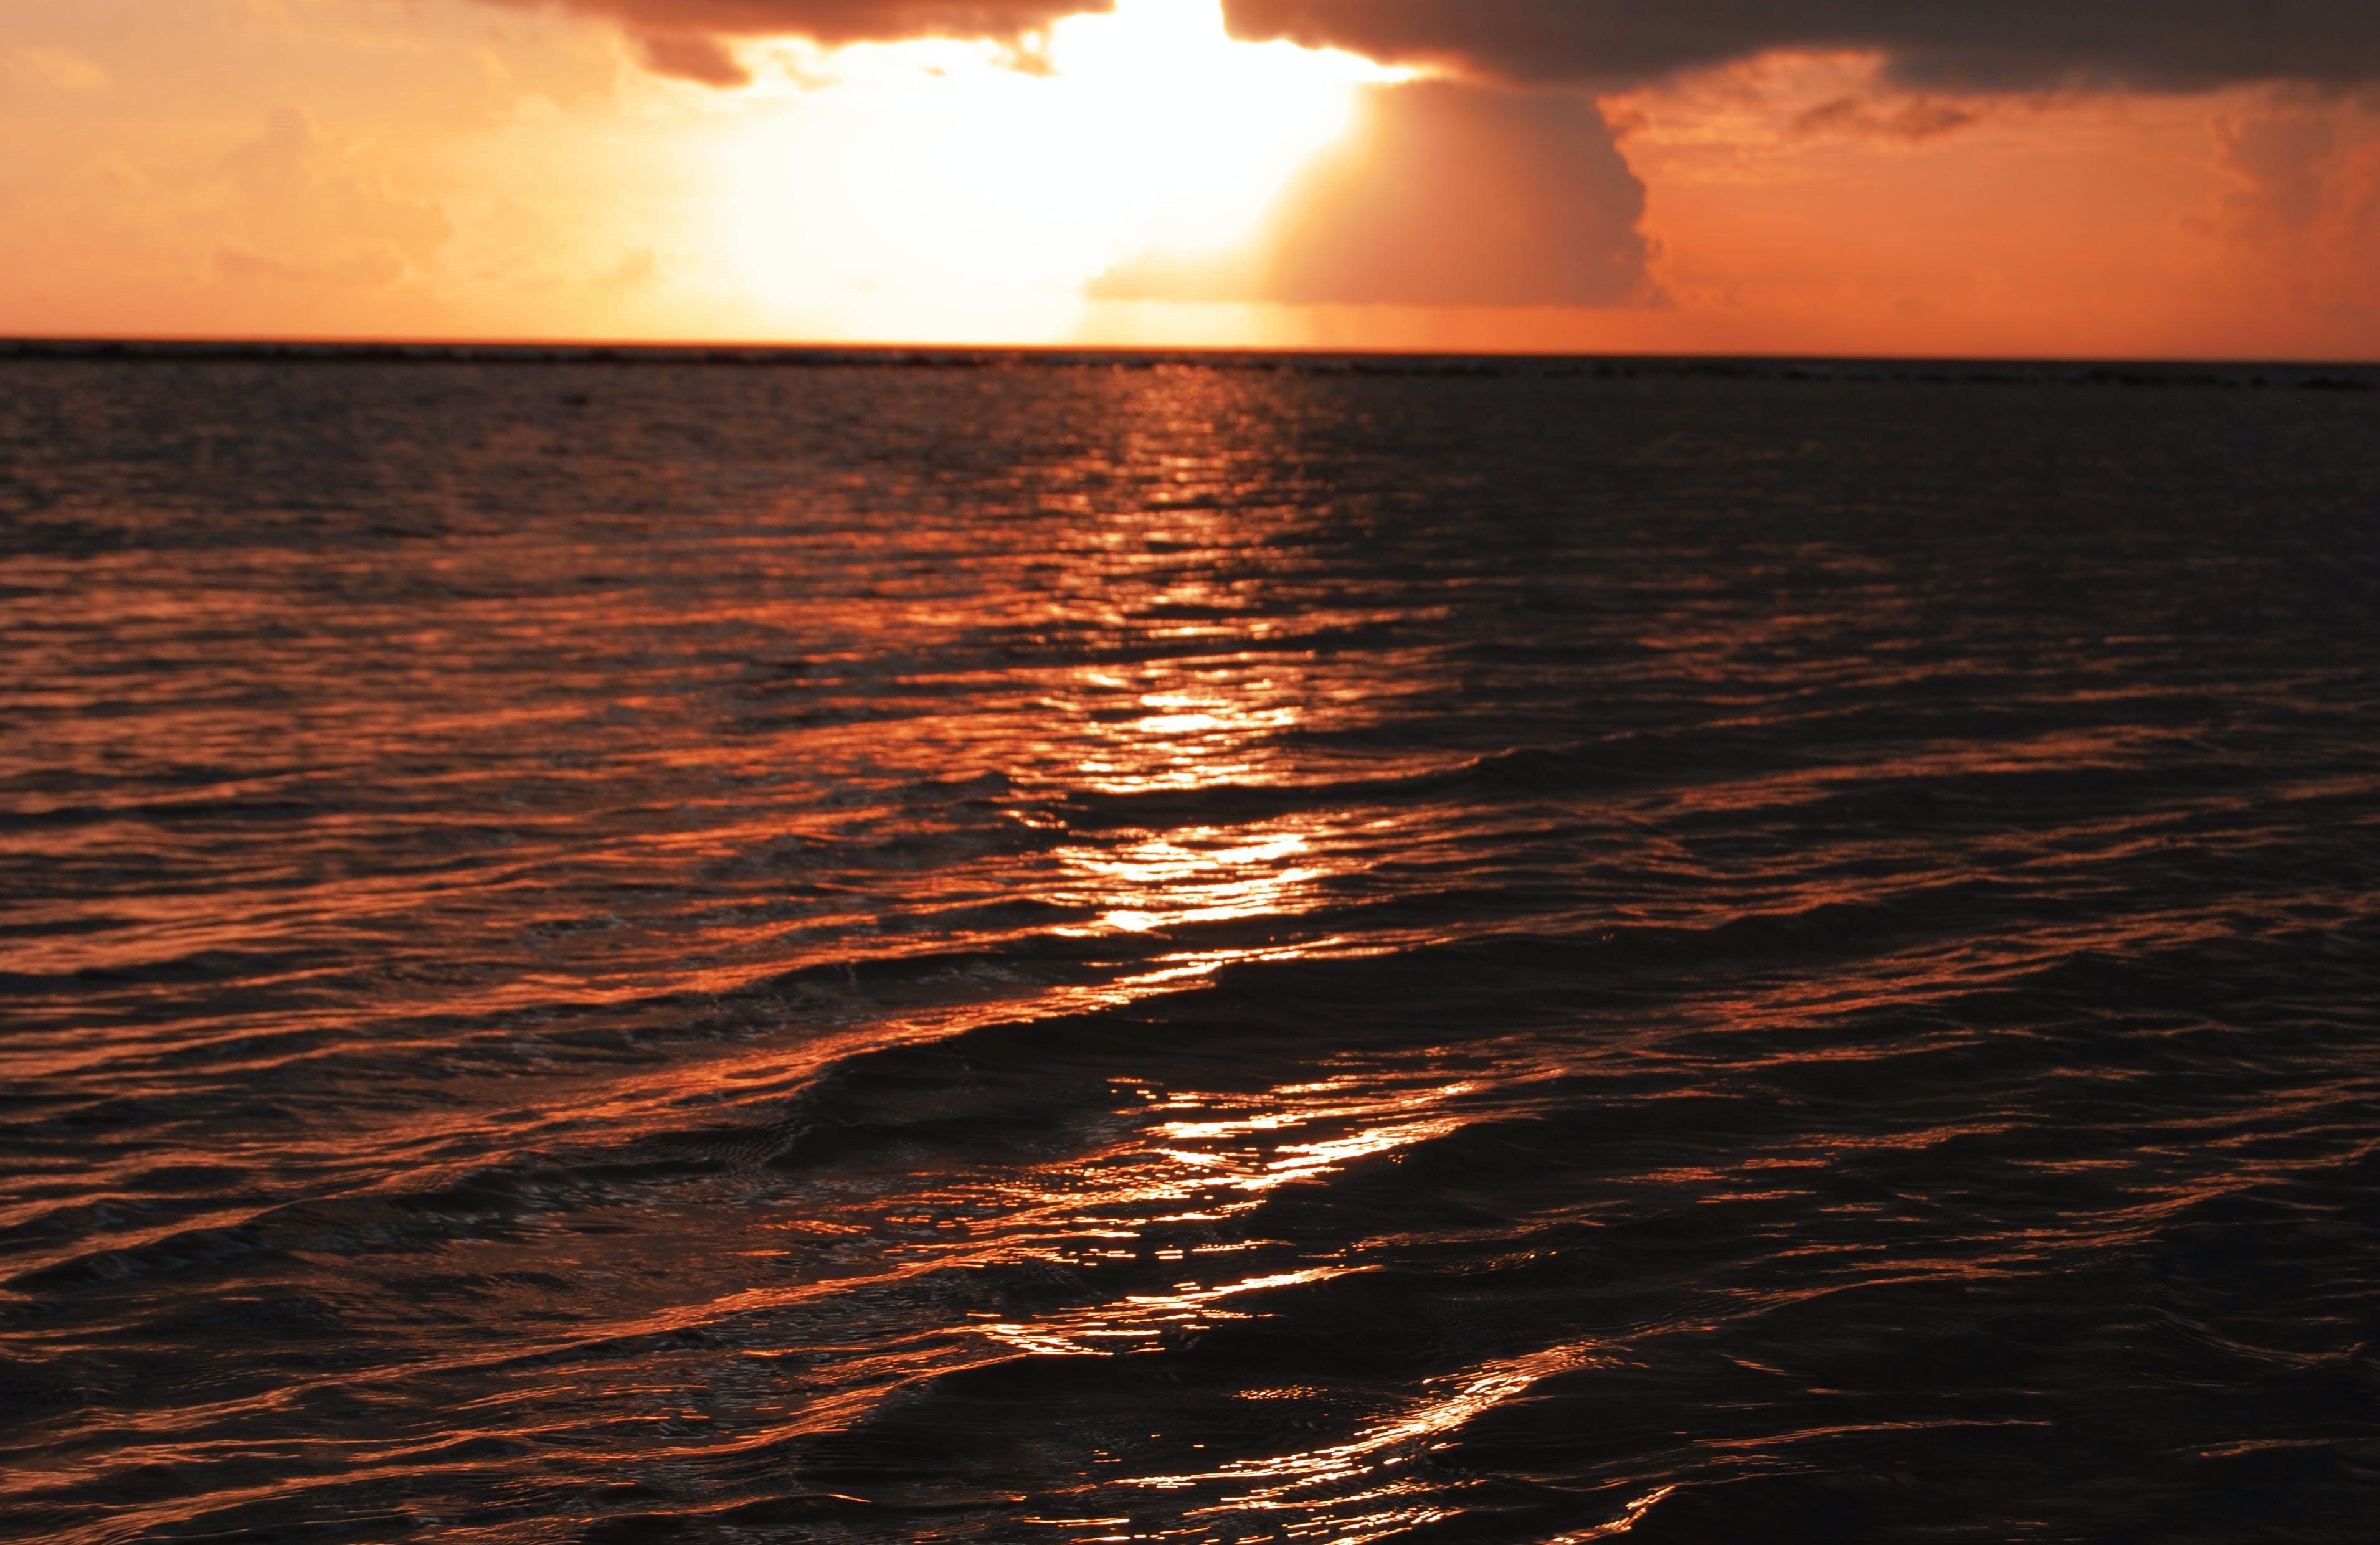 Free stock photo of evening sun, filter, nature photography, sunset